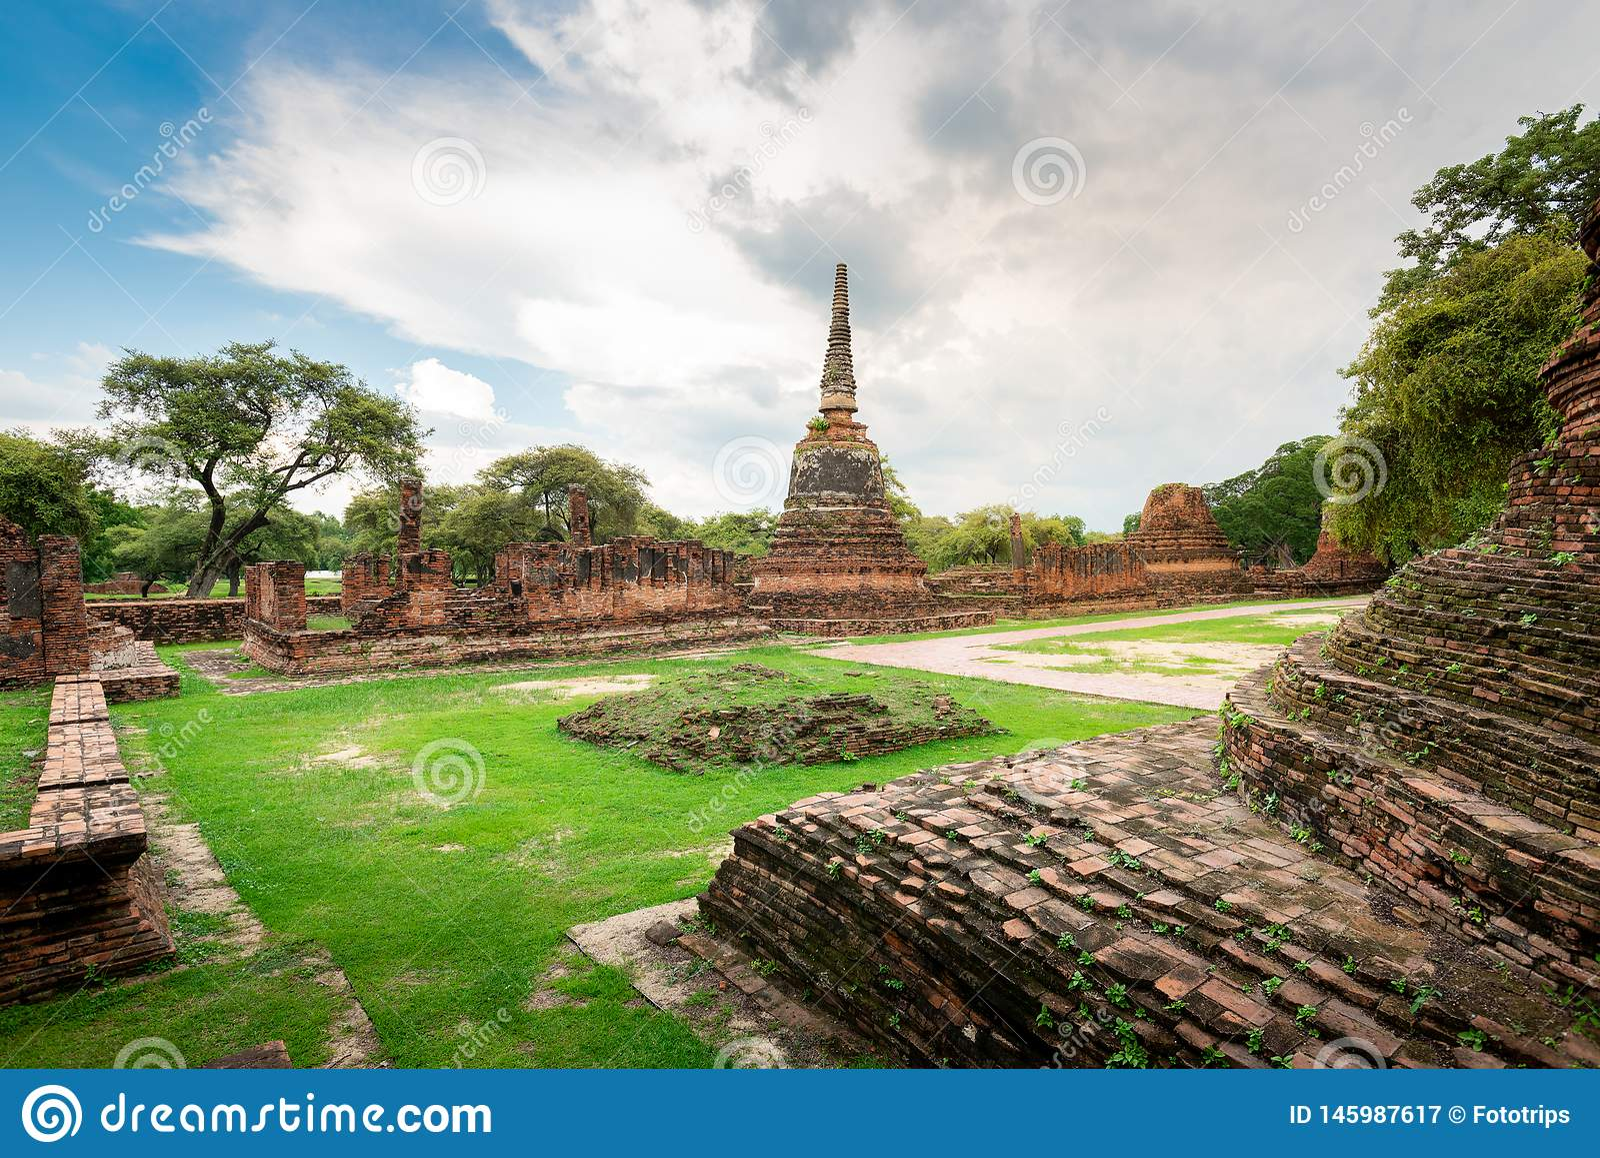 Thailand tempel - den gamla pagoden p? Wat Yai Chai Mongkhon, historiska Ayutthaya parkerar, Thailand